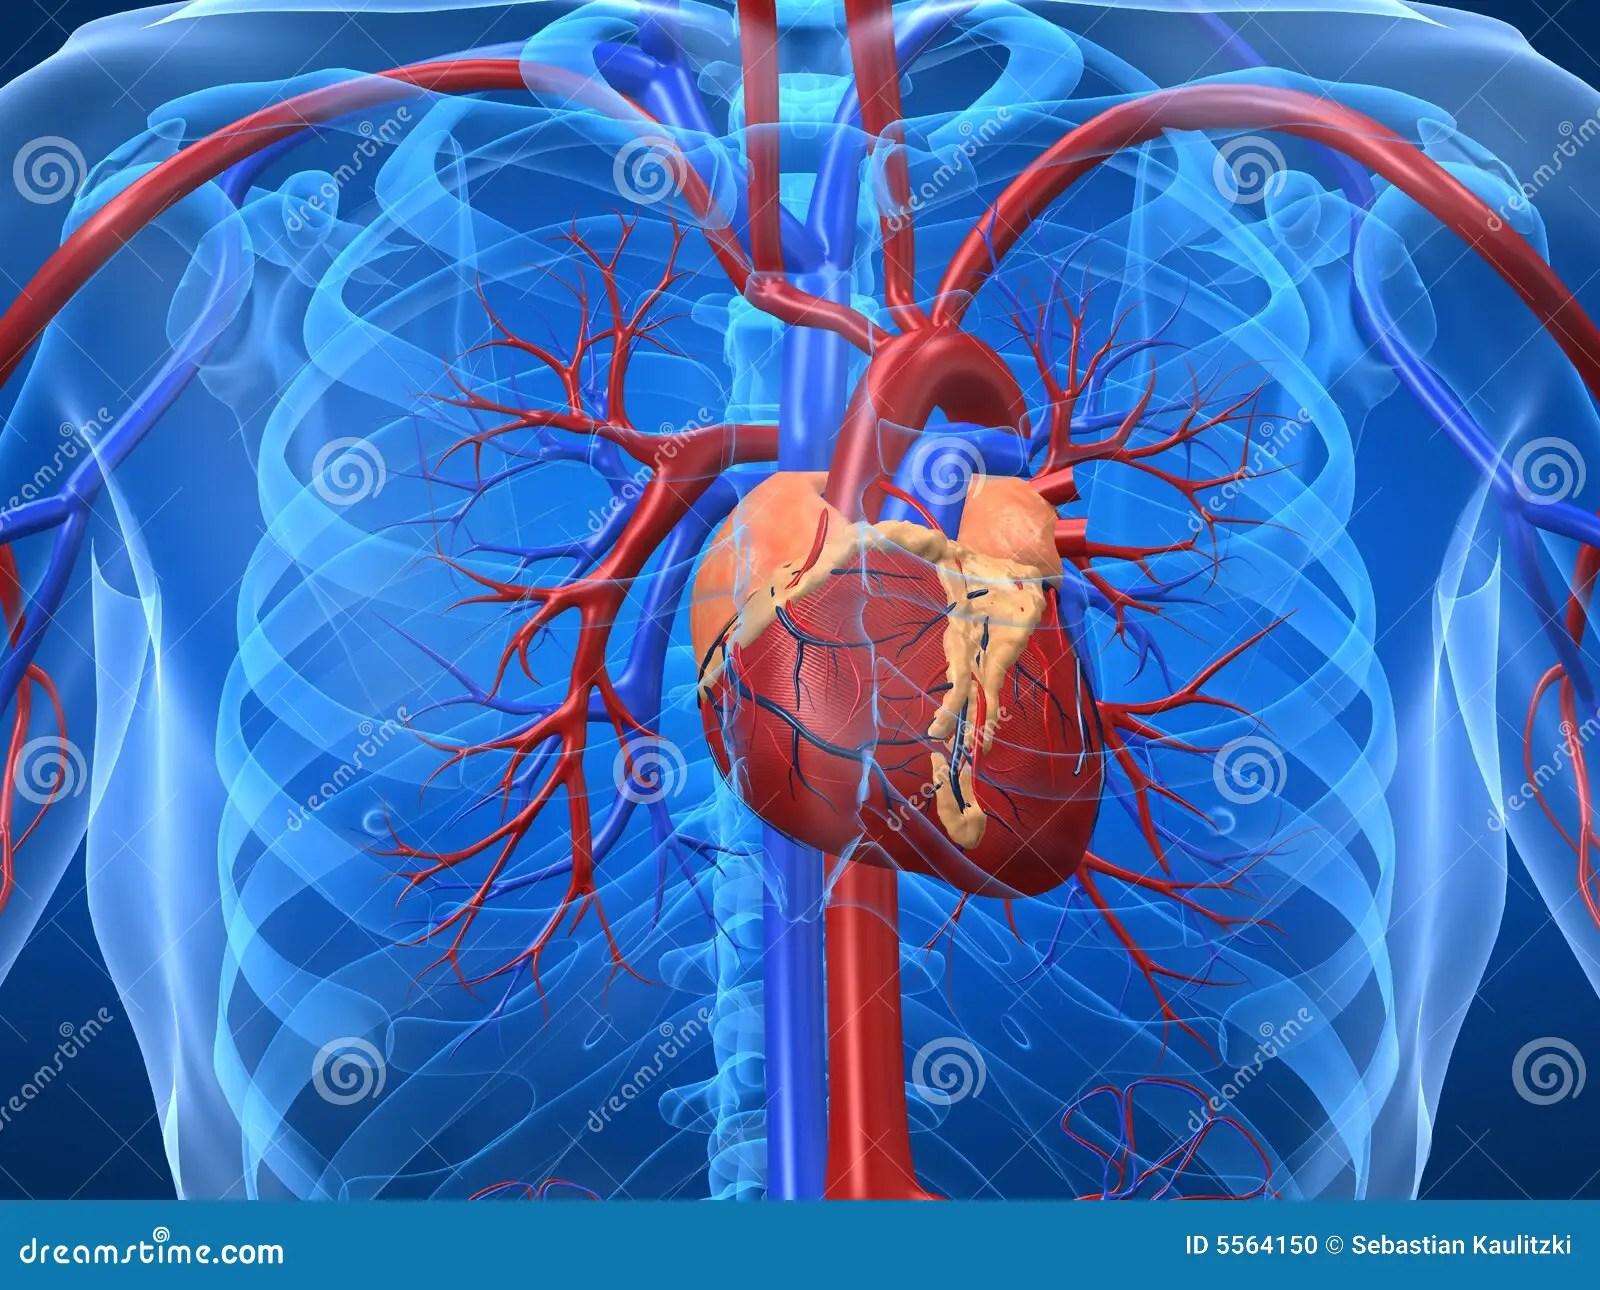 Cardiovascular Disease Diagram Cardiovascular System Stock Illustration Illustration Of